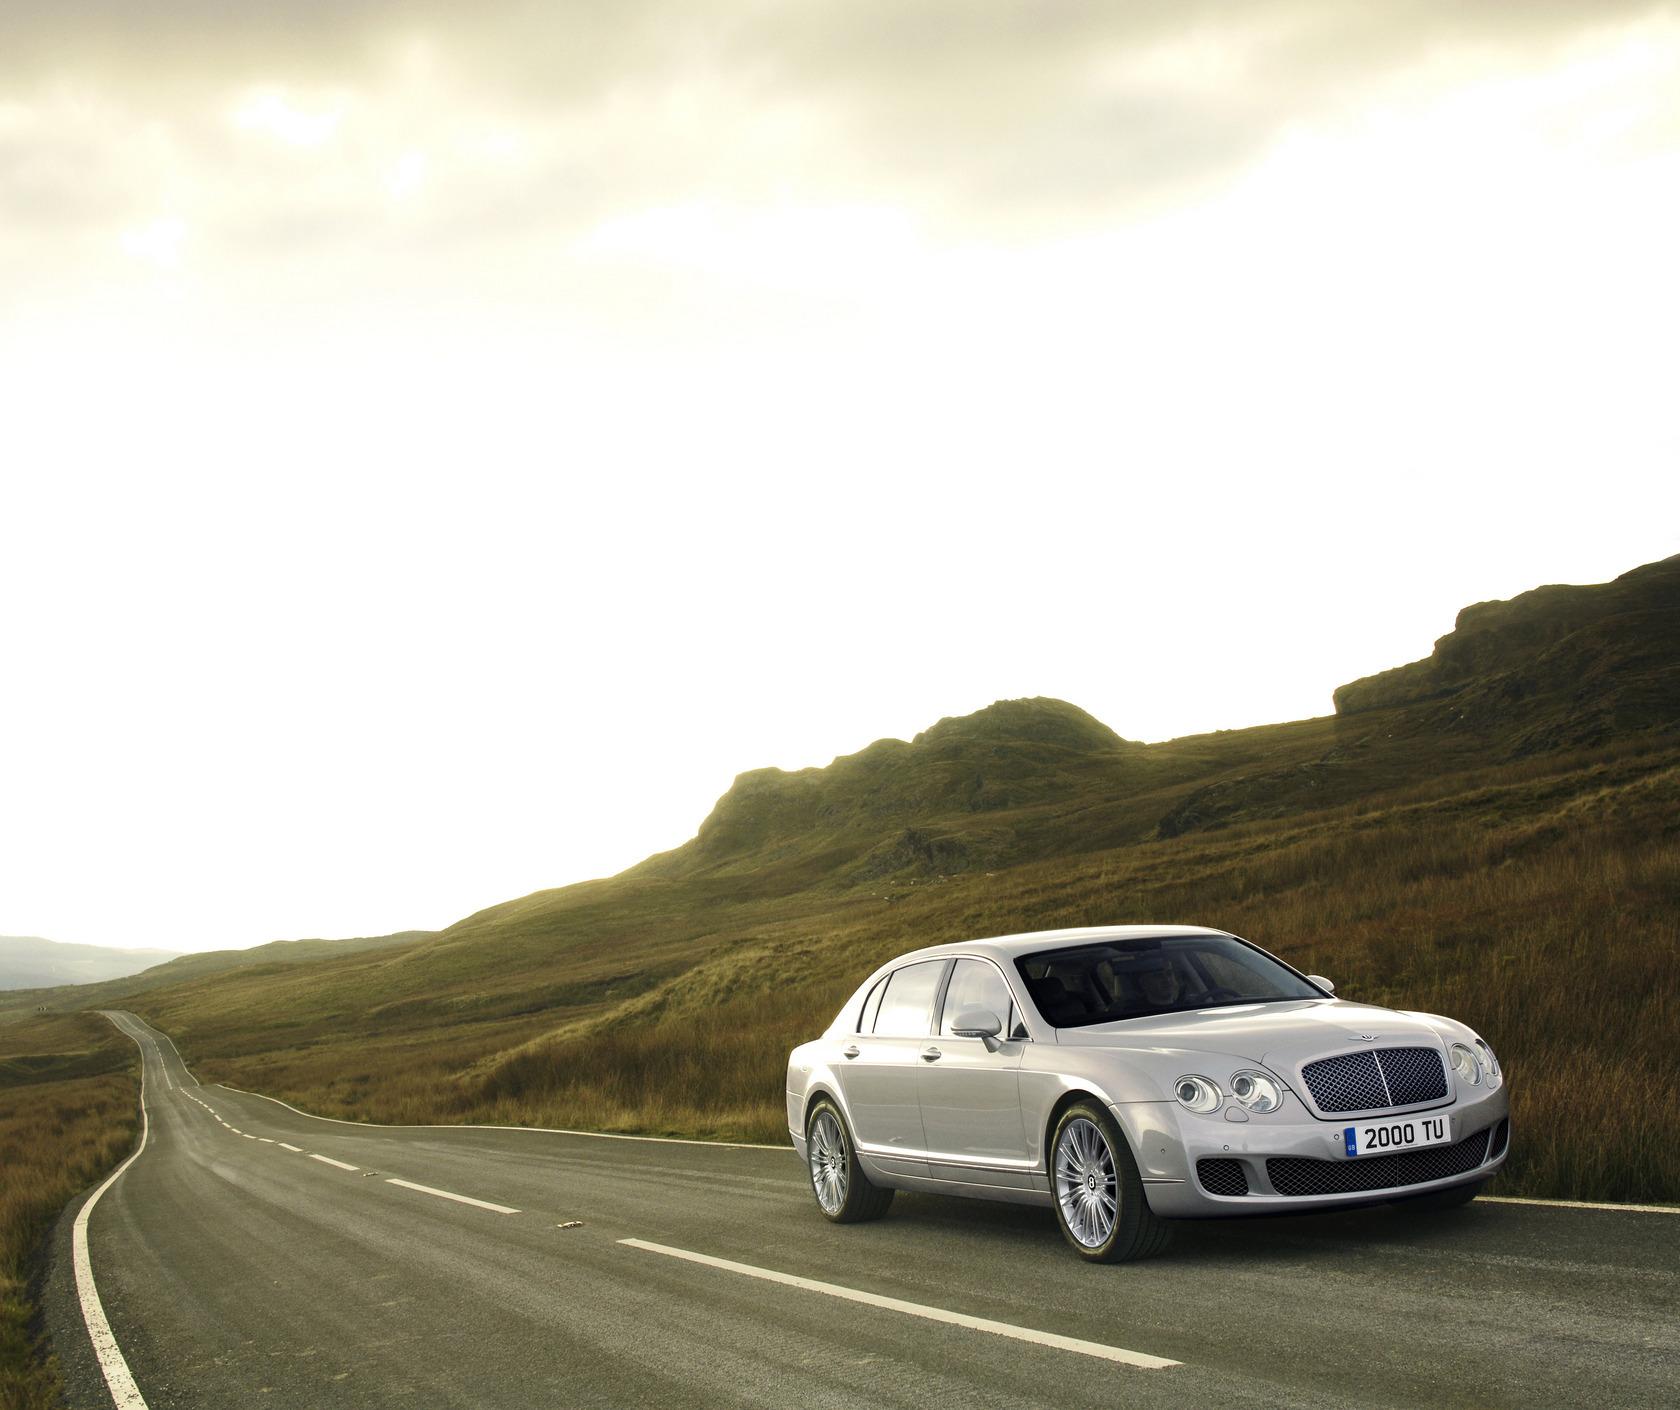 Bentley Continental GT Speed Auto Wallpapers GroenLicht.be